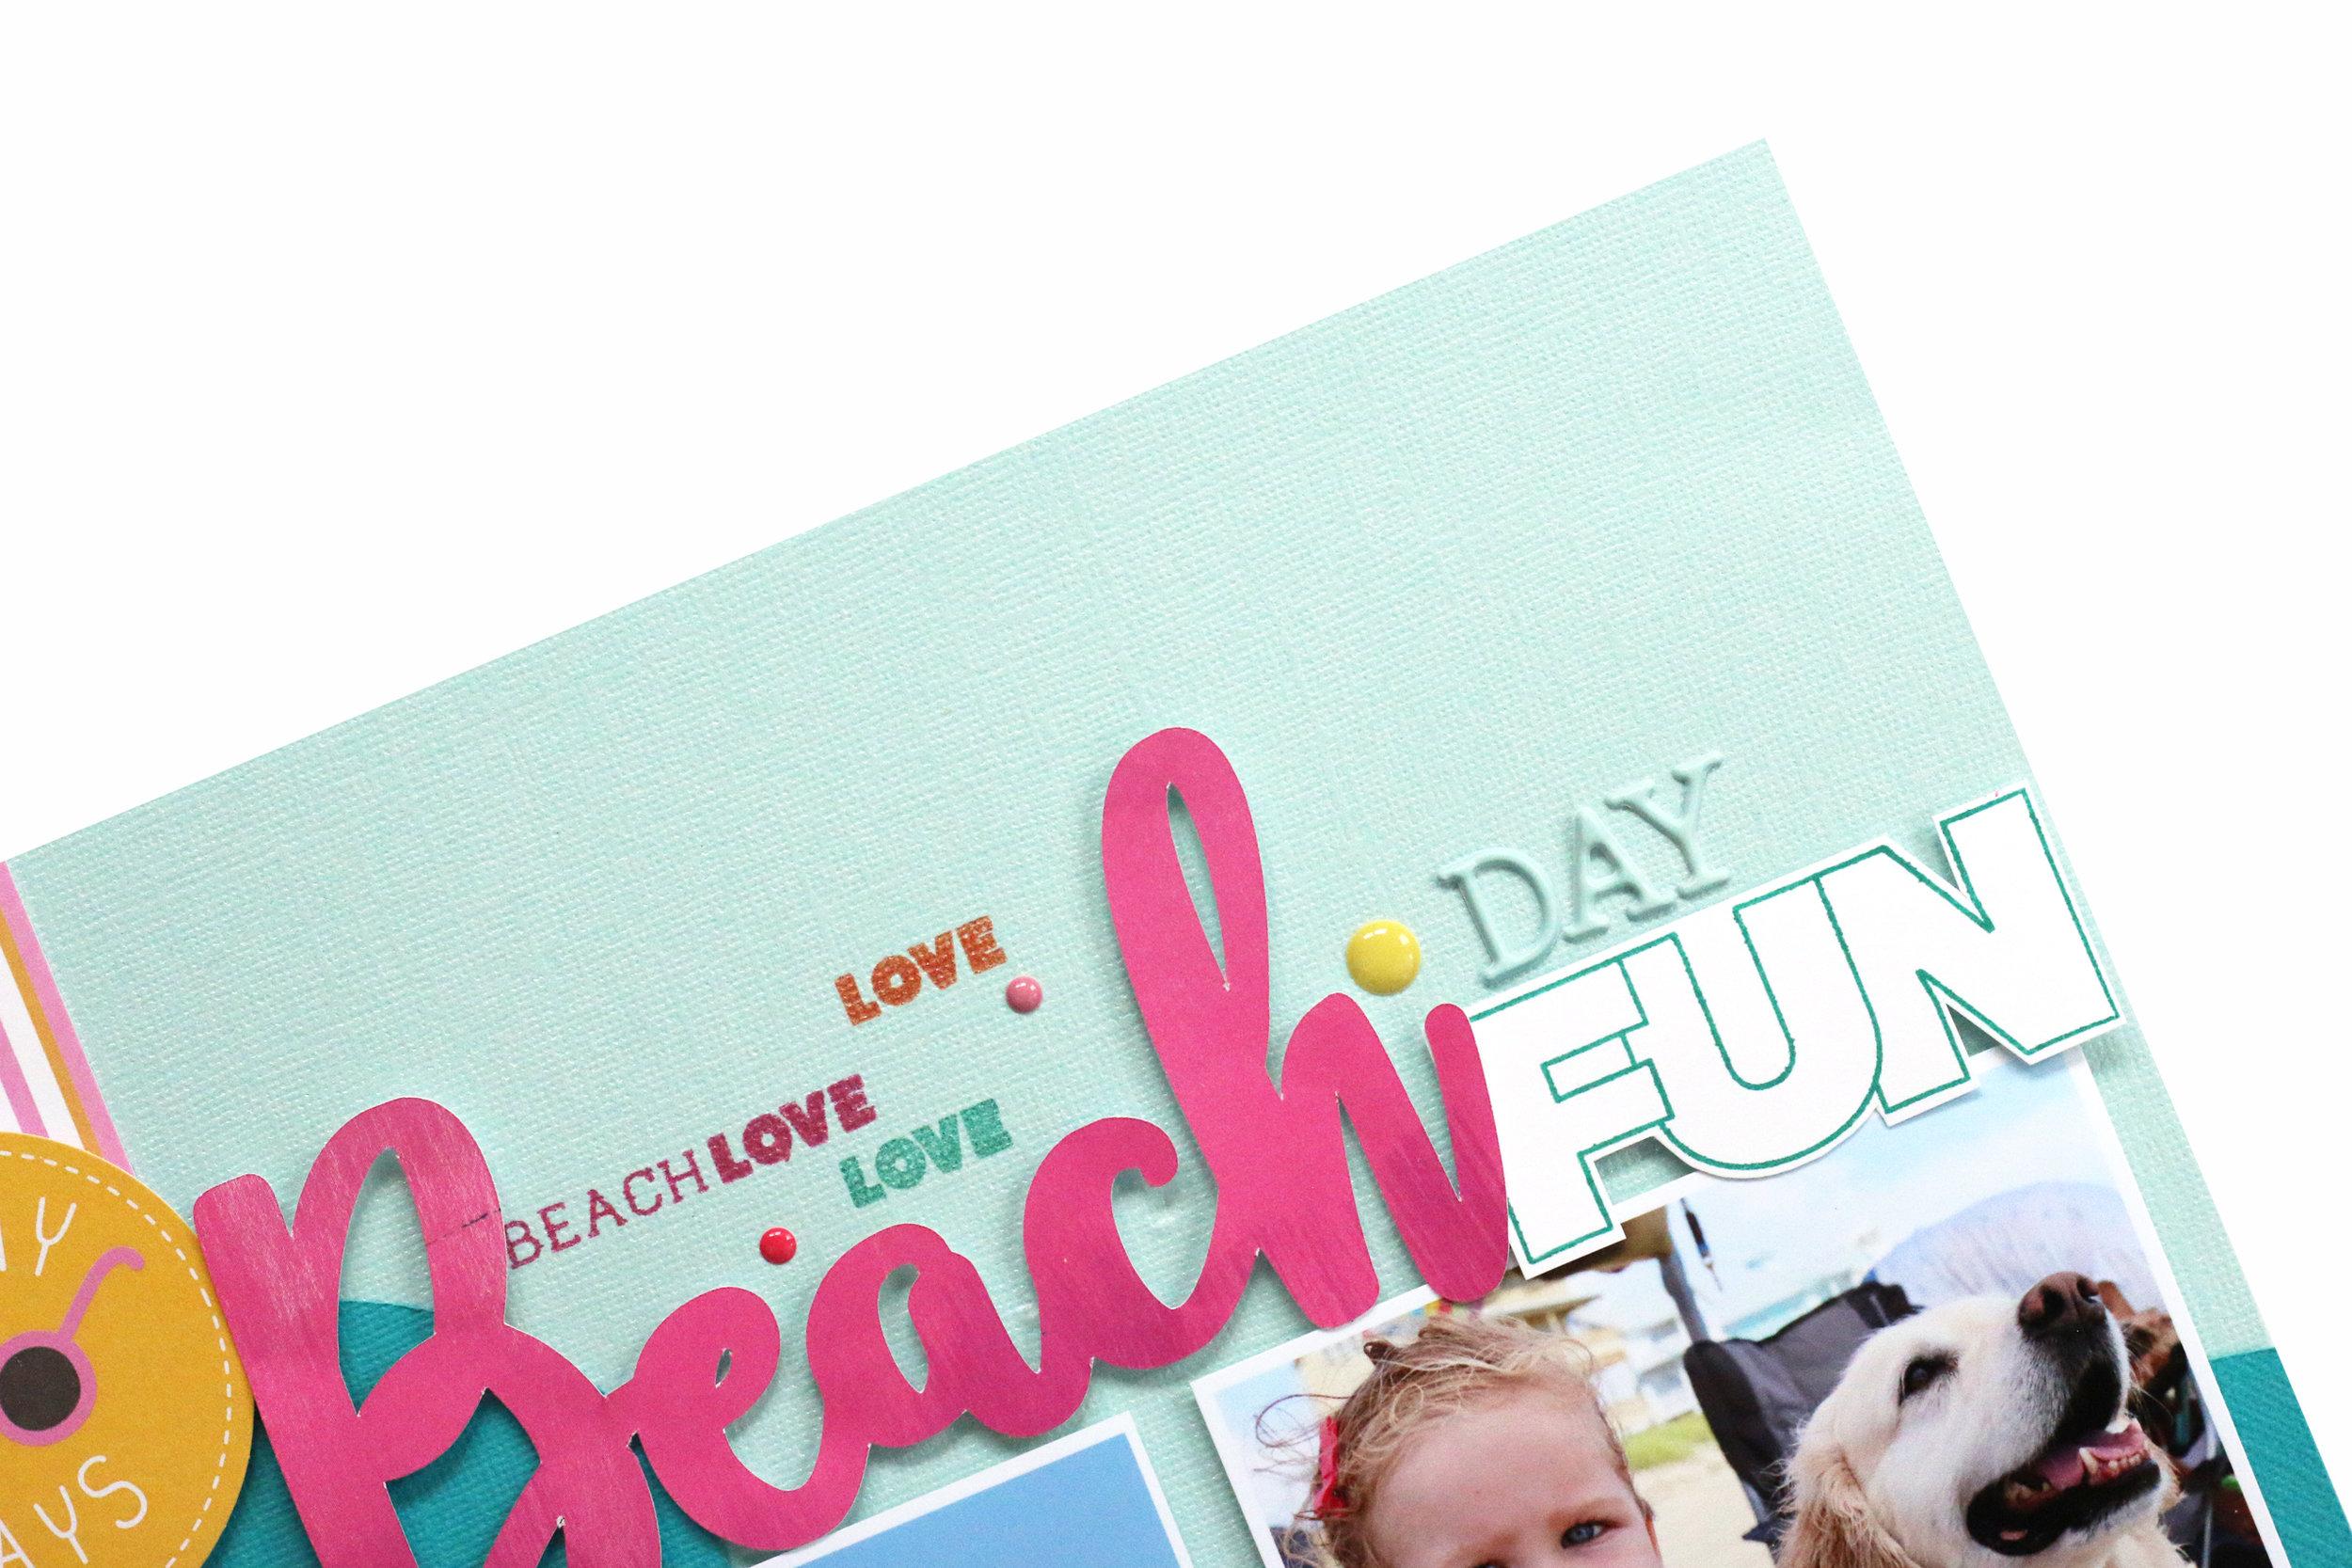 SCTMagazine_MeghannAndrew_BeachDayFun_06.jpg